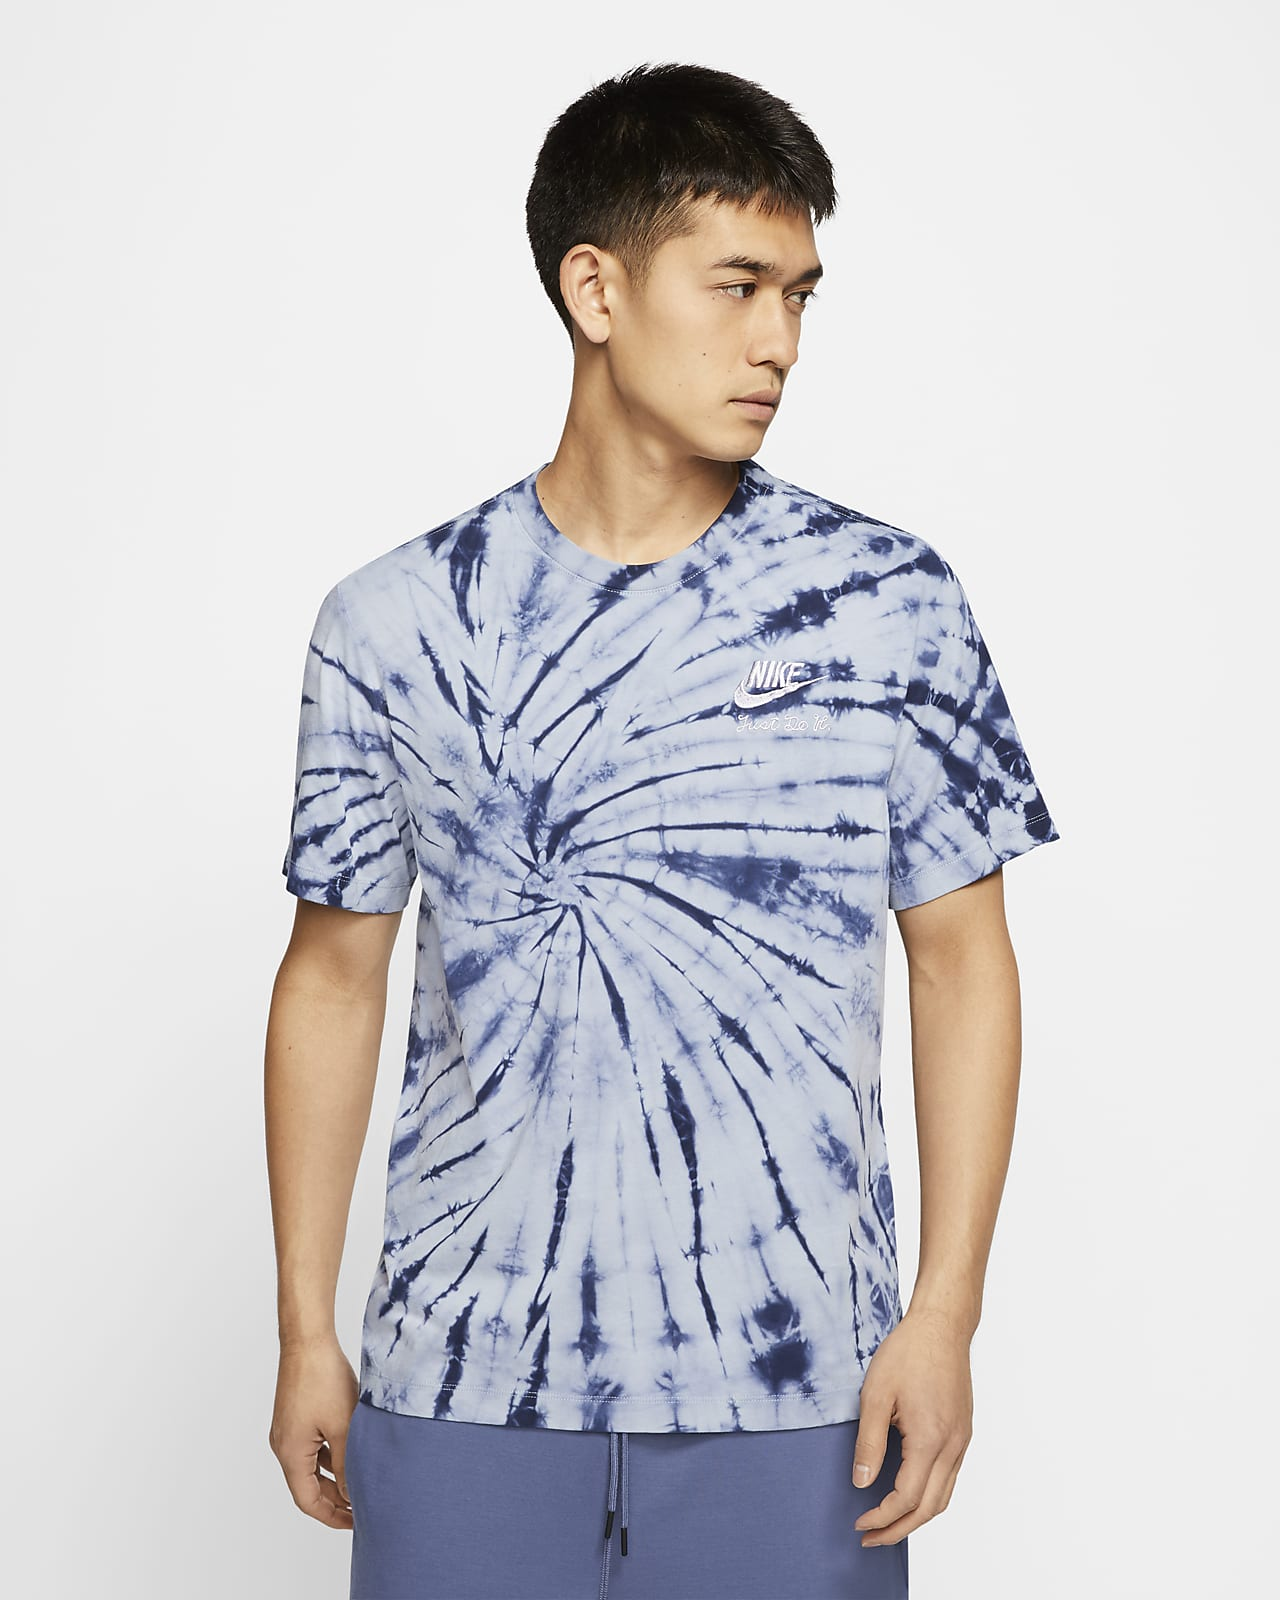 sportswear-mens-t-shirt-7j4KgD